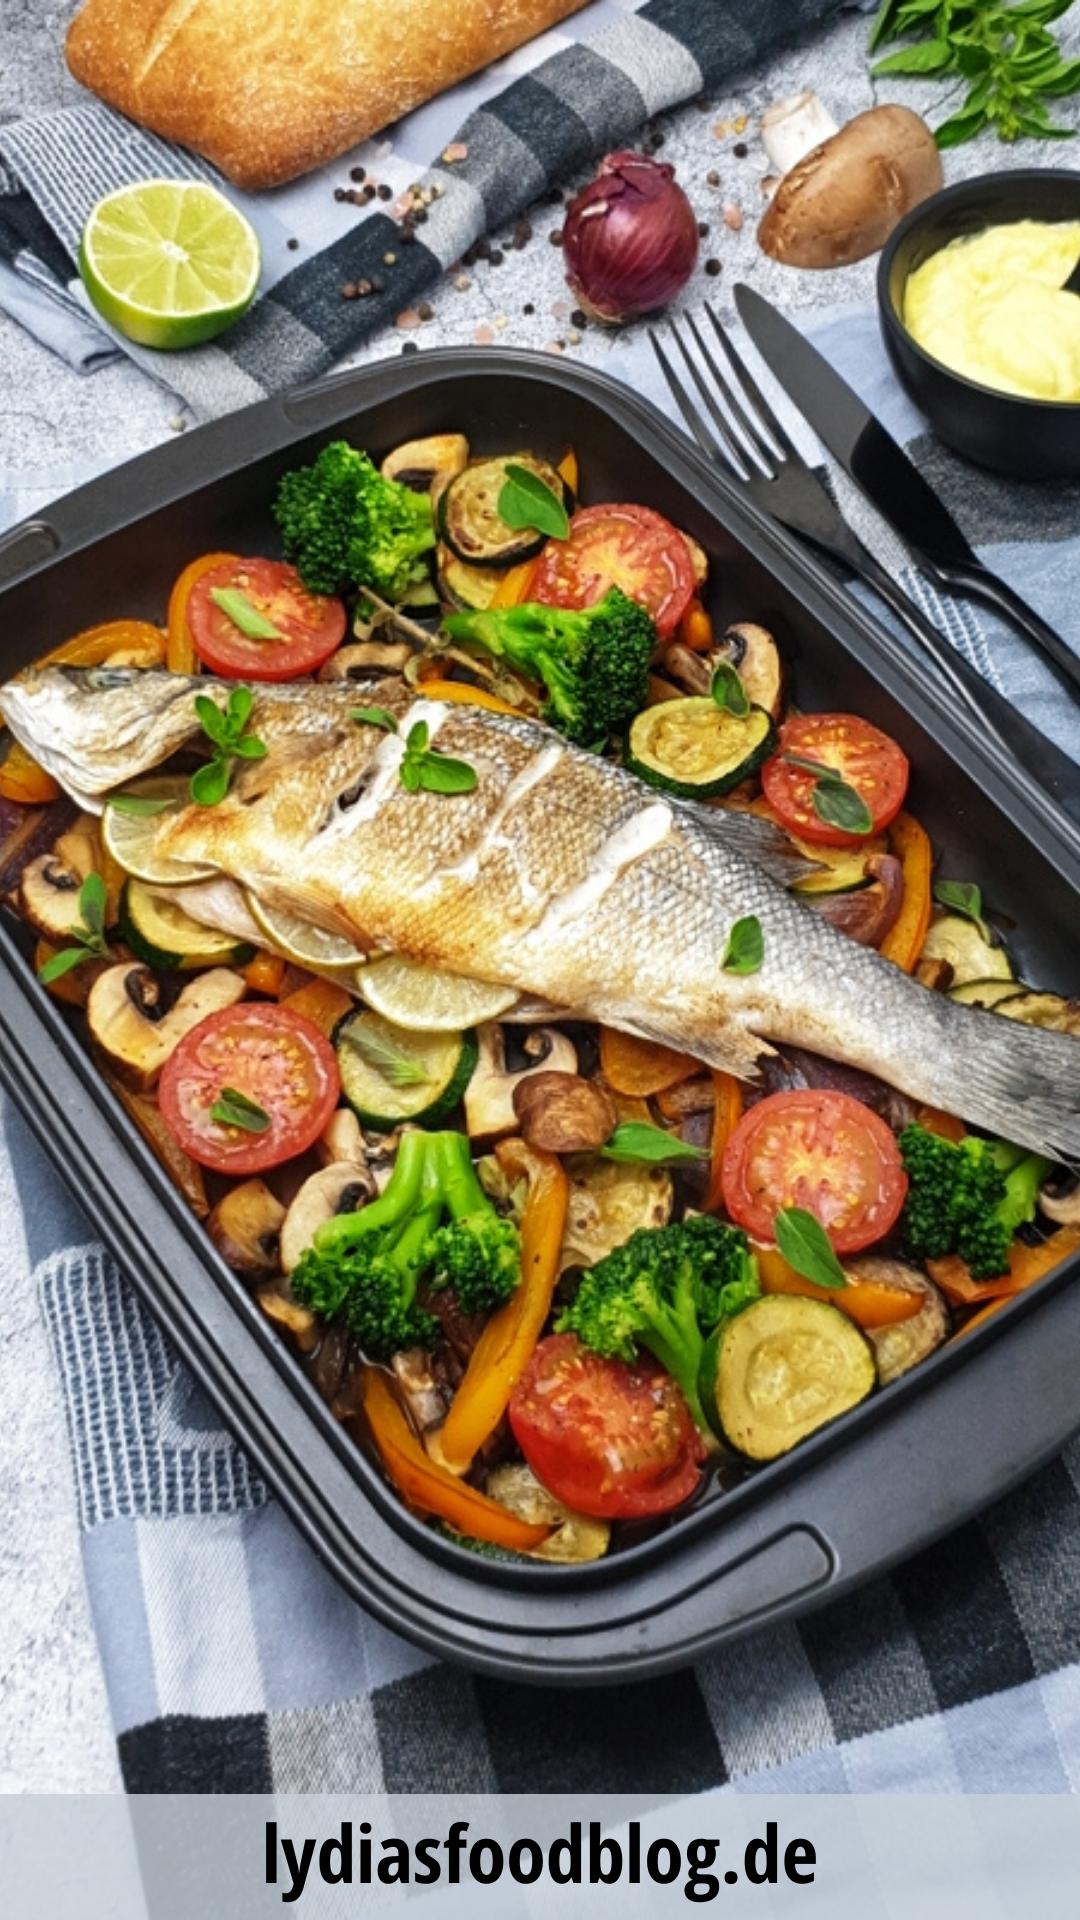 53e5dcbce74870035d985e68cec7723e - Rezepte Fisch